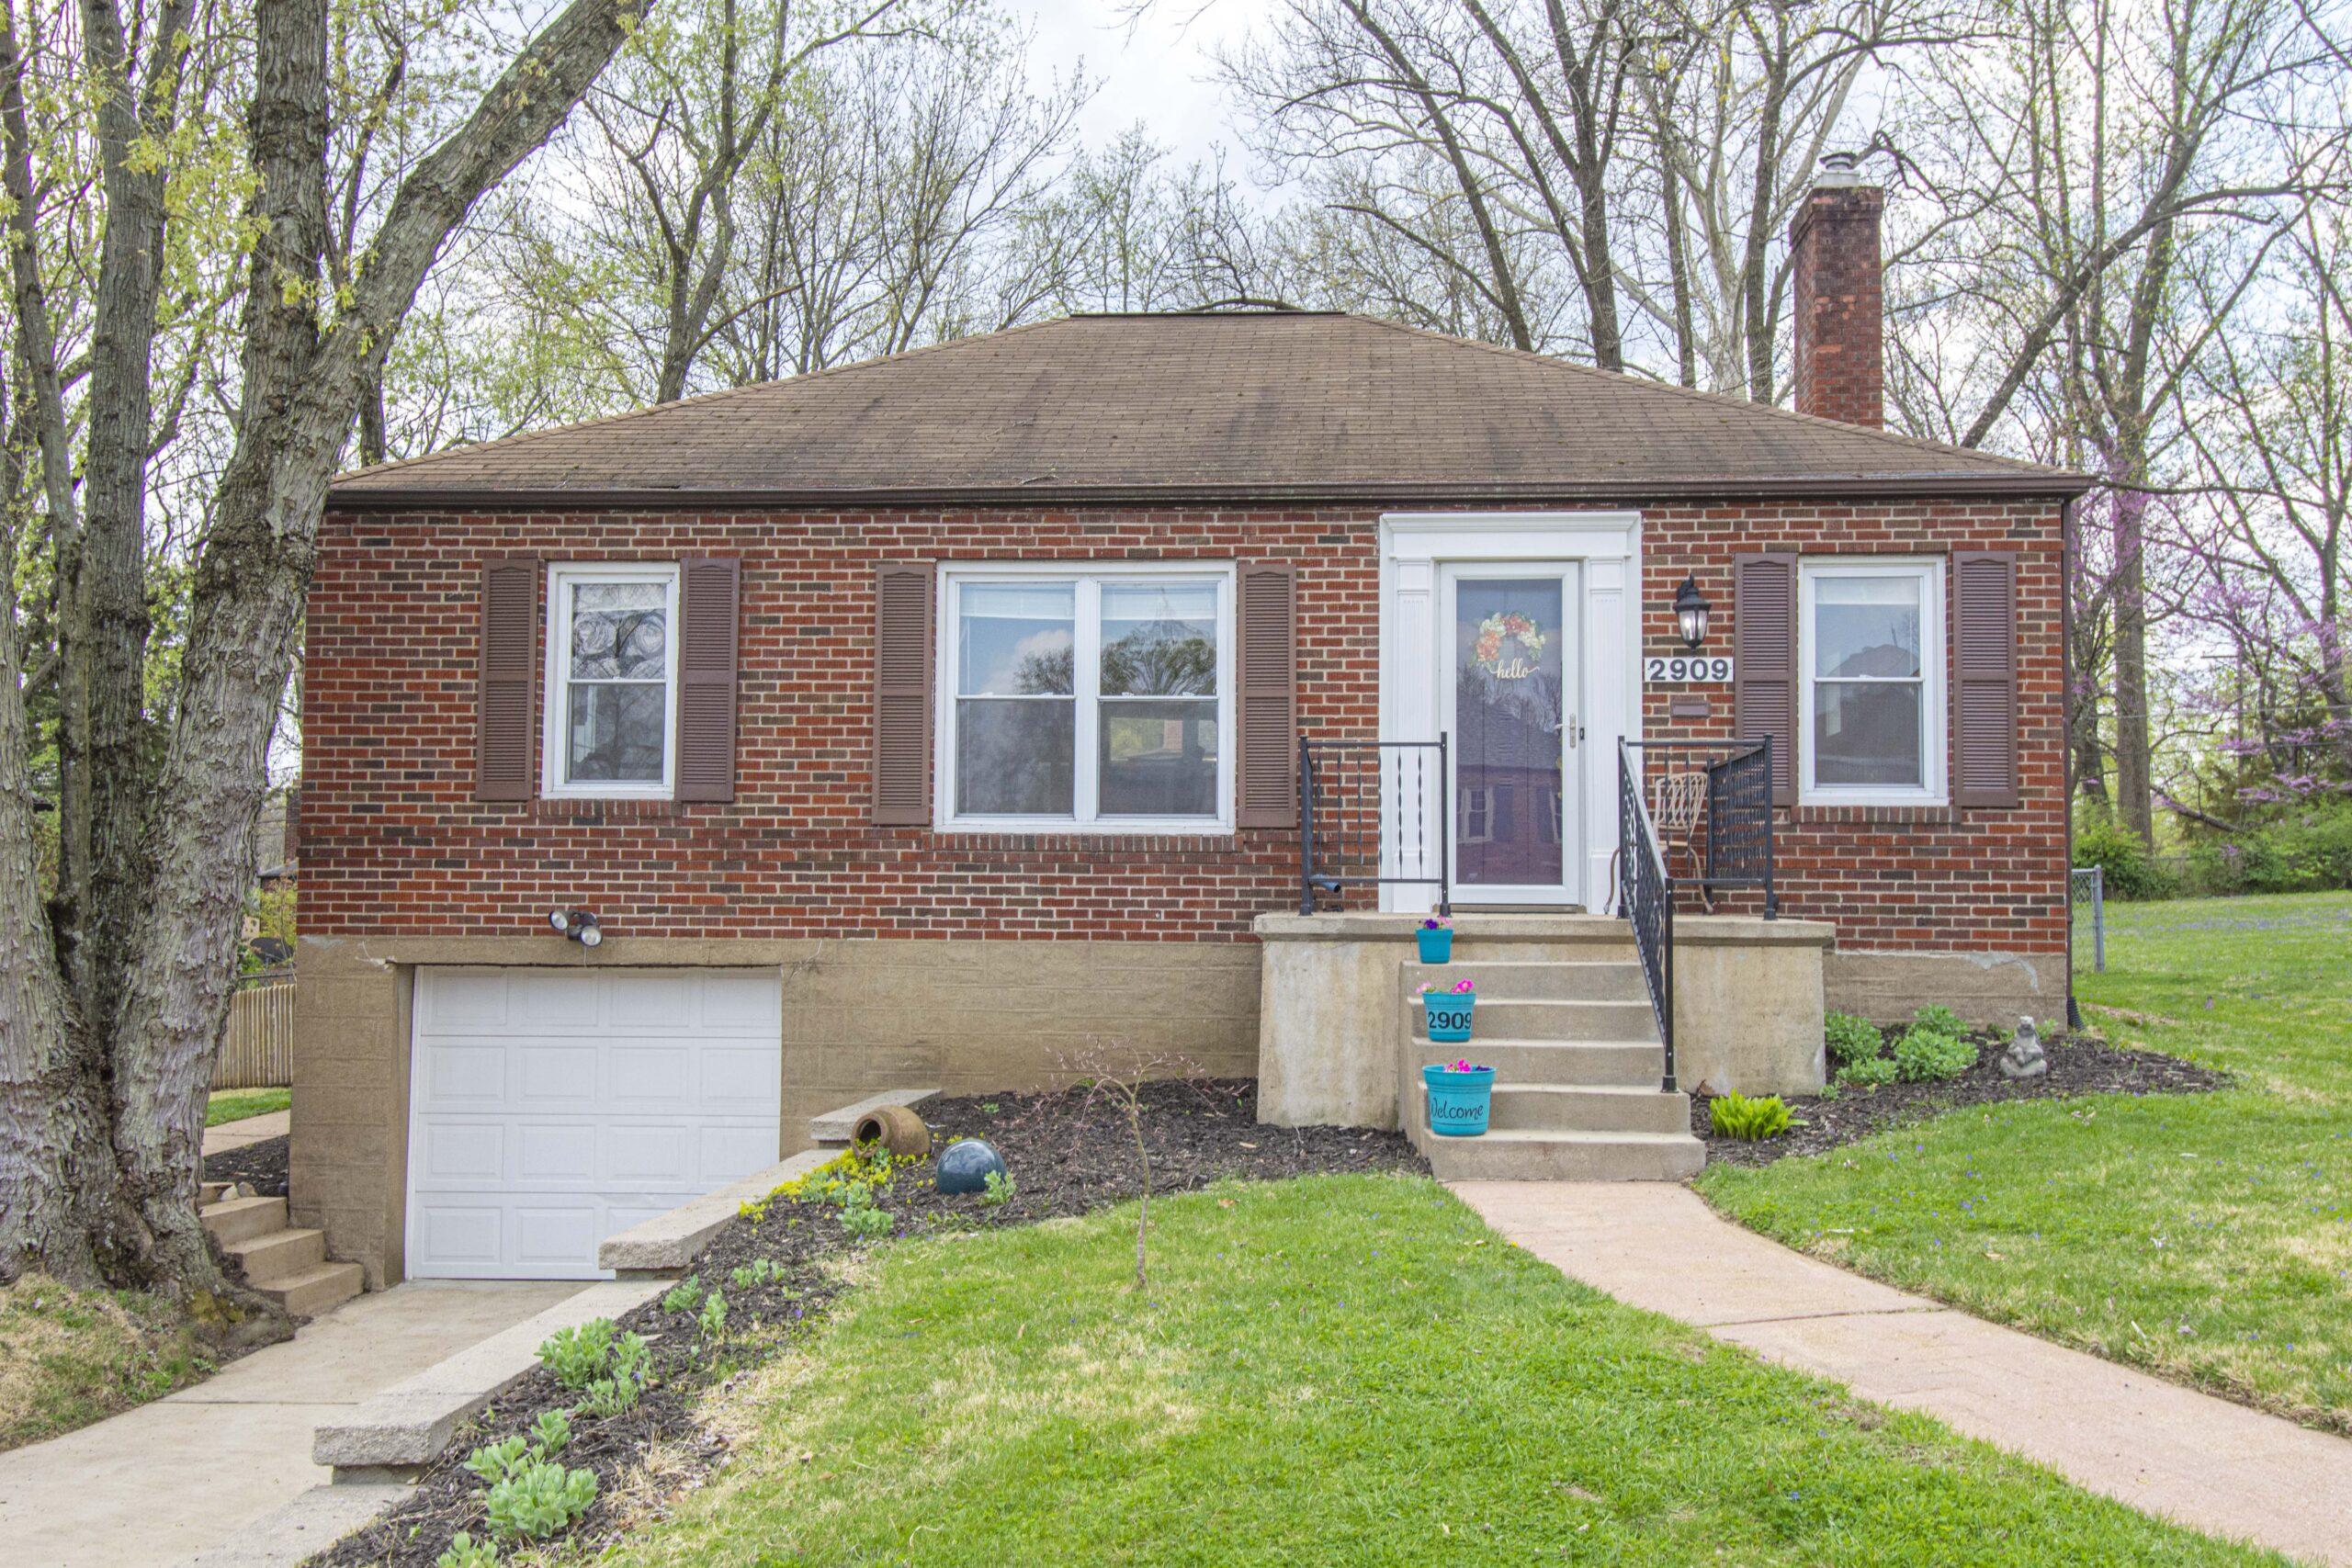 2909 Wingate Ct St. Louis MO / Rock Hill Neighborhood